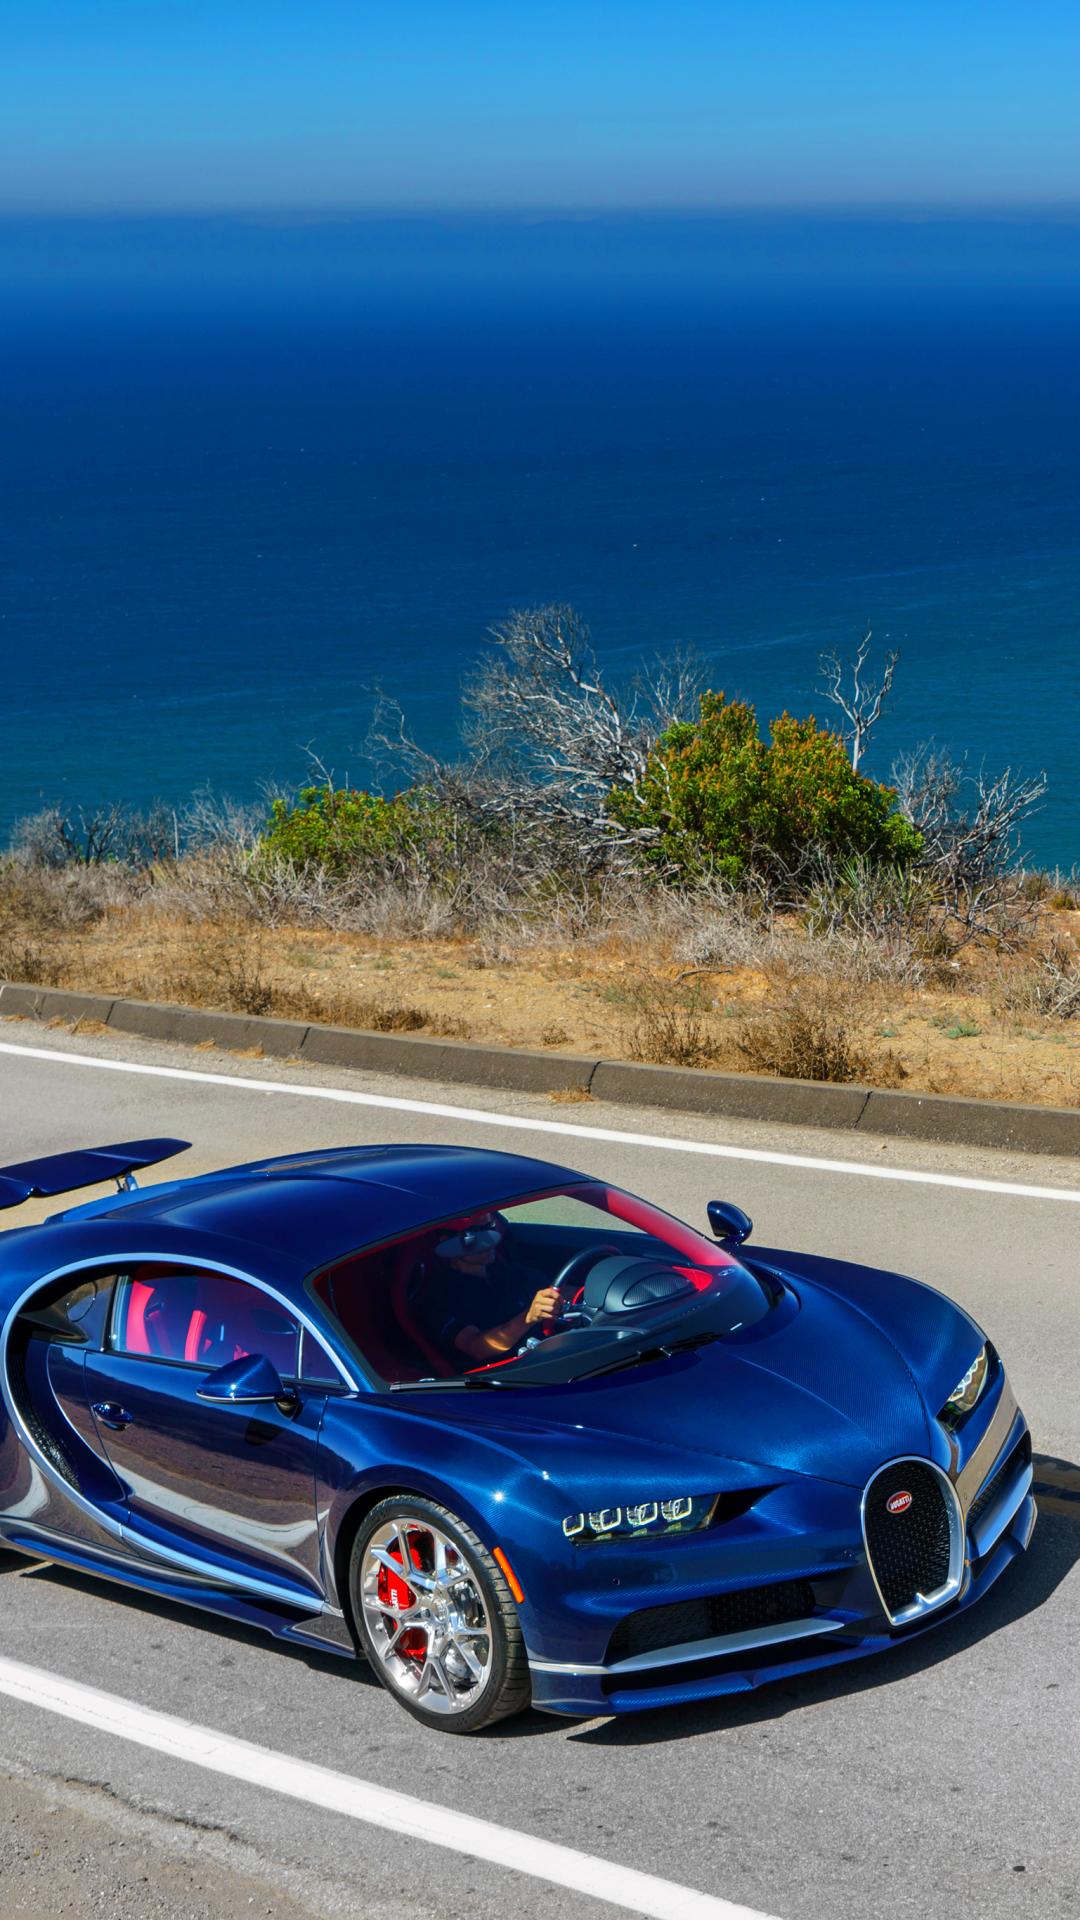 8 Bugatti Chiron Apple IPhone 6 750x1334 Wallpapers